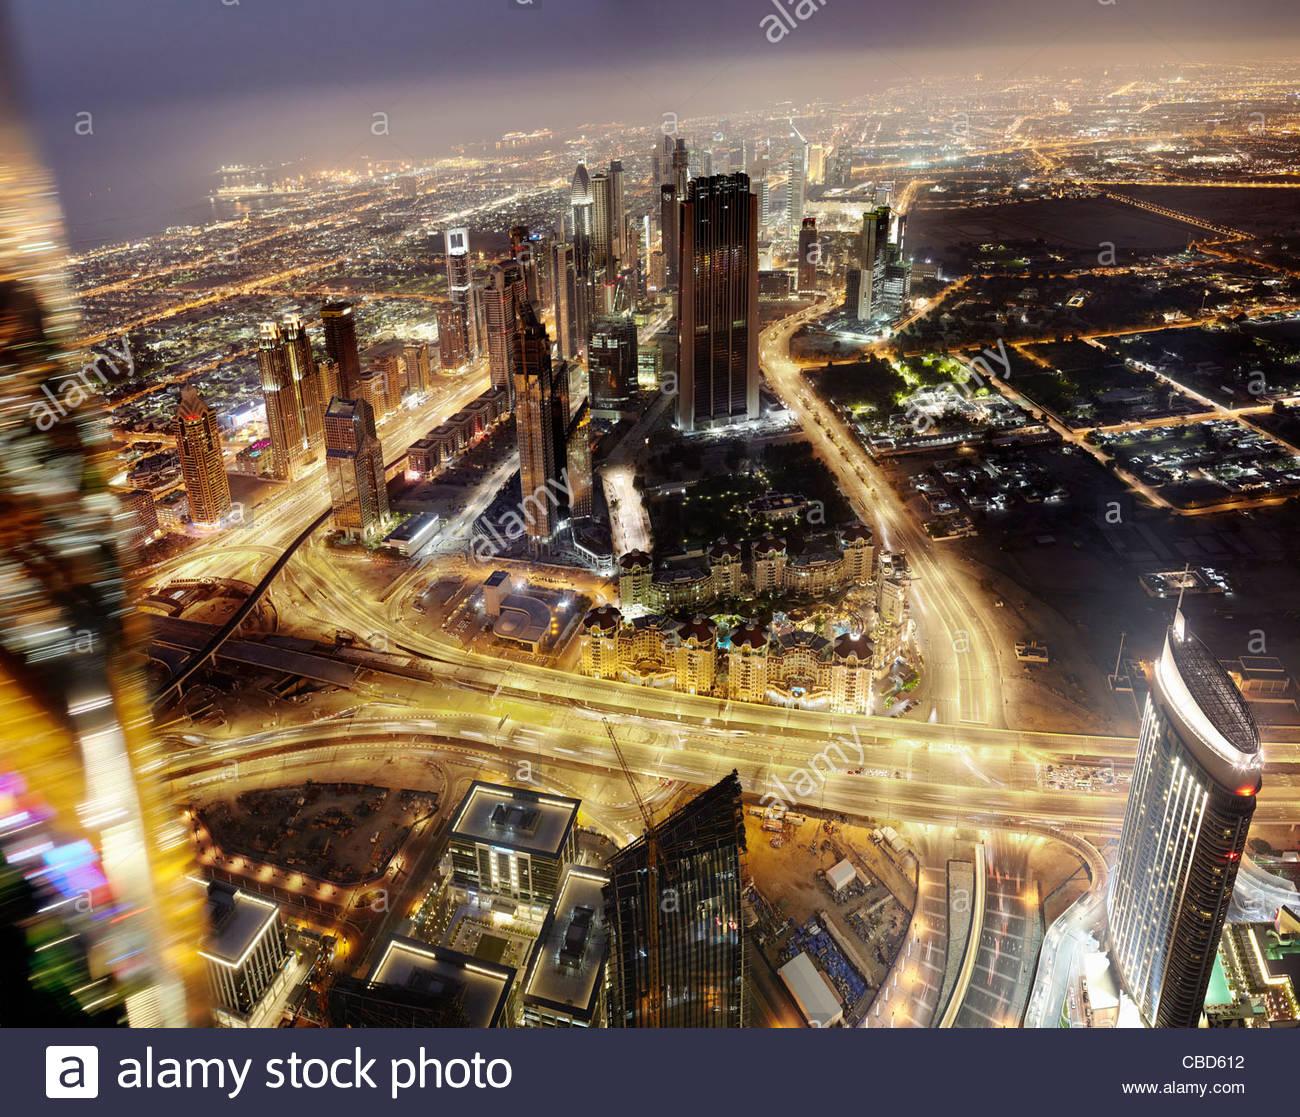 Aerial time-lapse view of Dubai - Stock Image